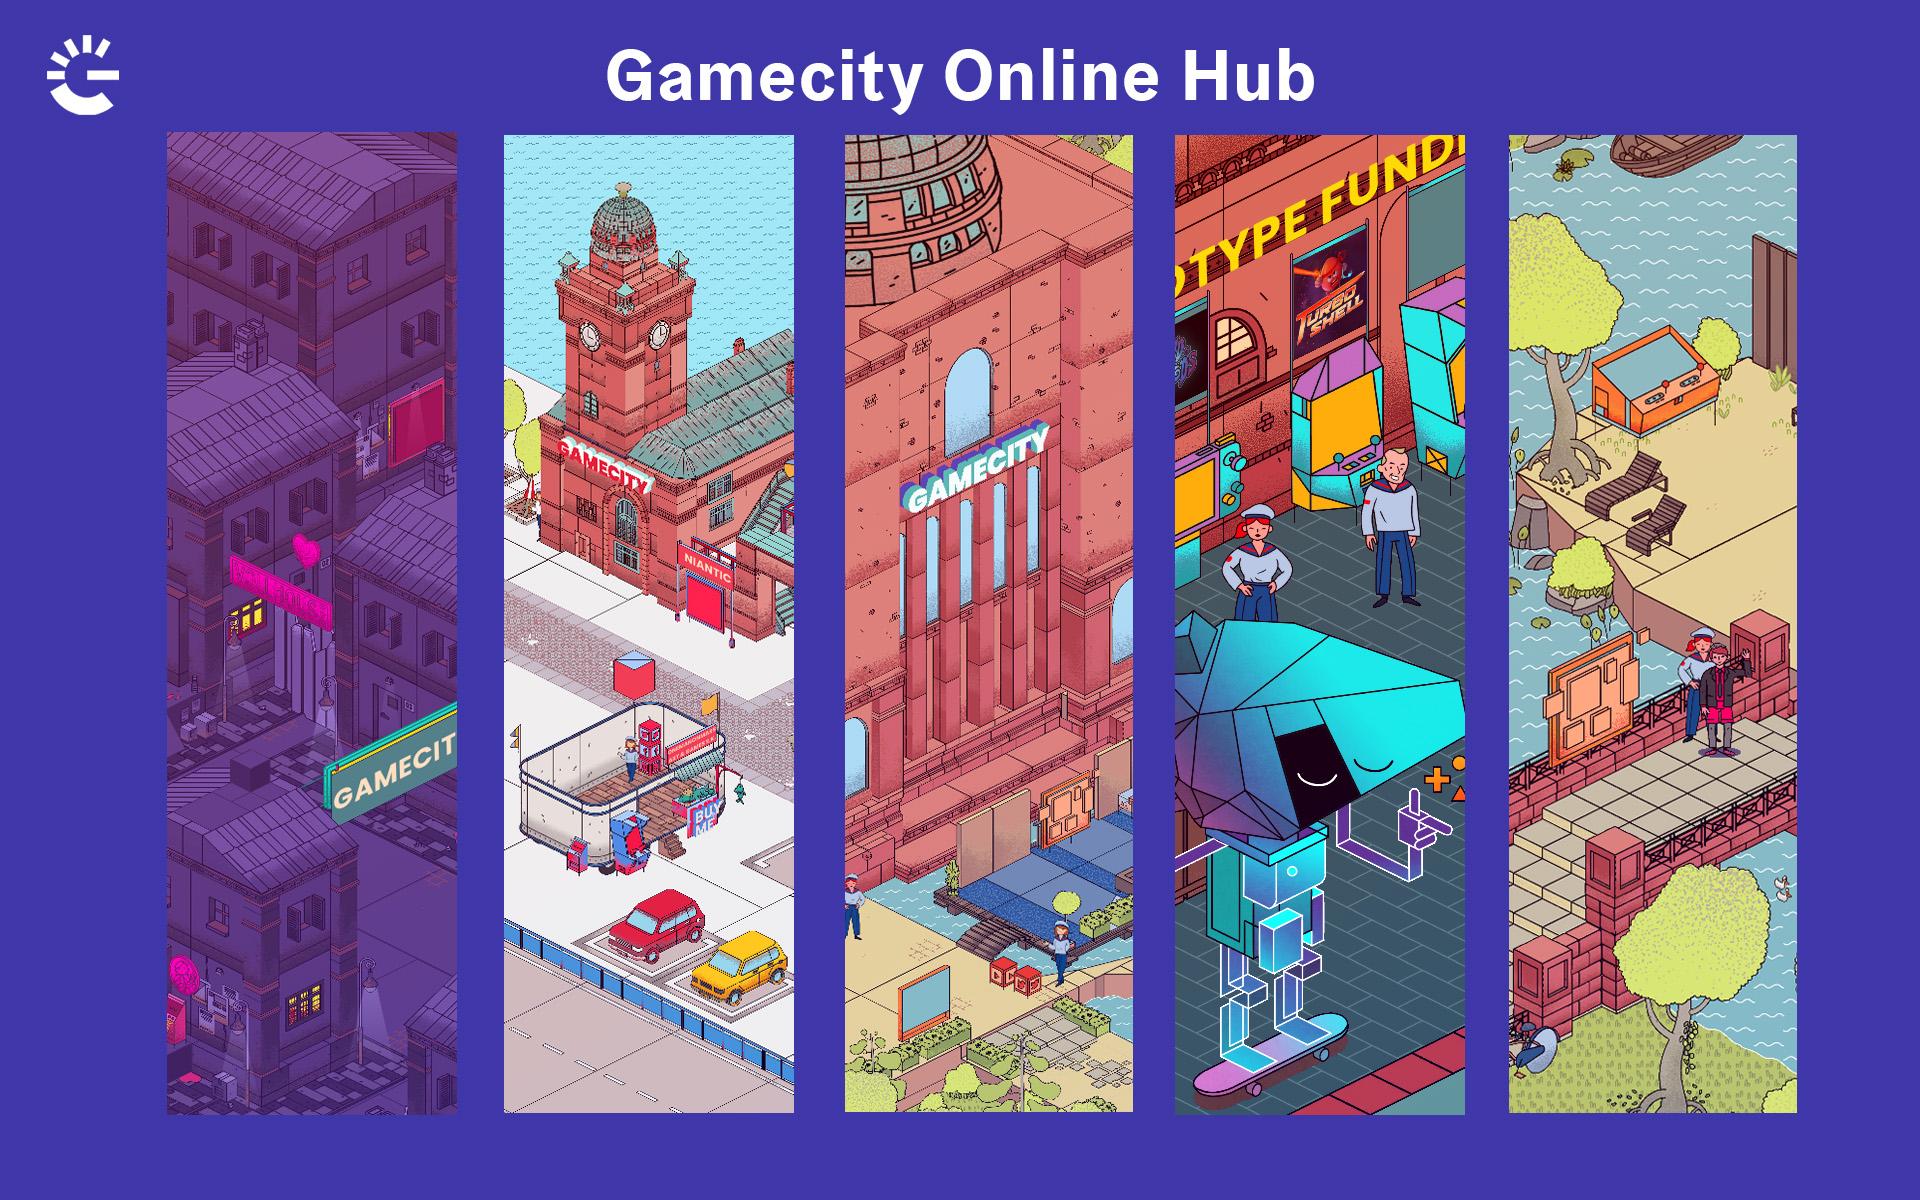 grafik gamecity online hub hamburg games branche